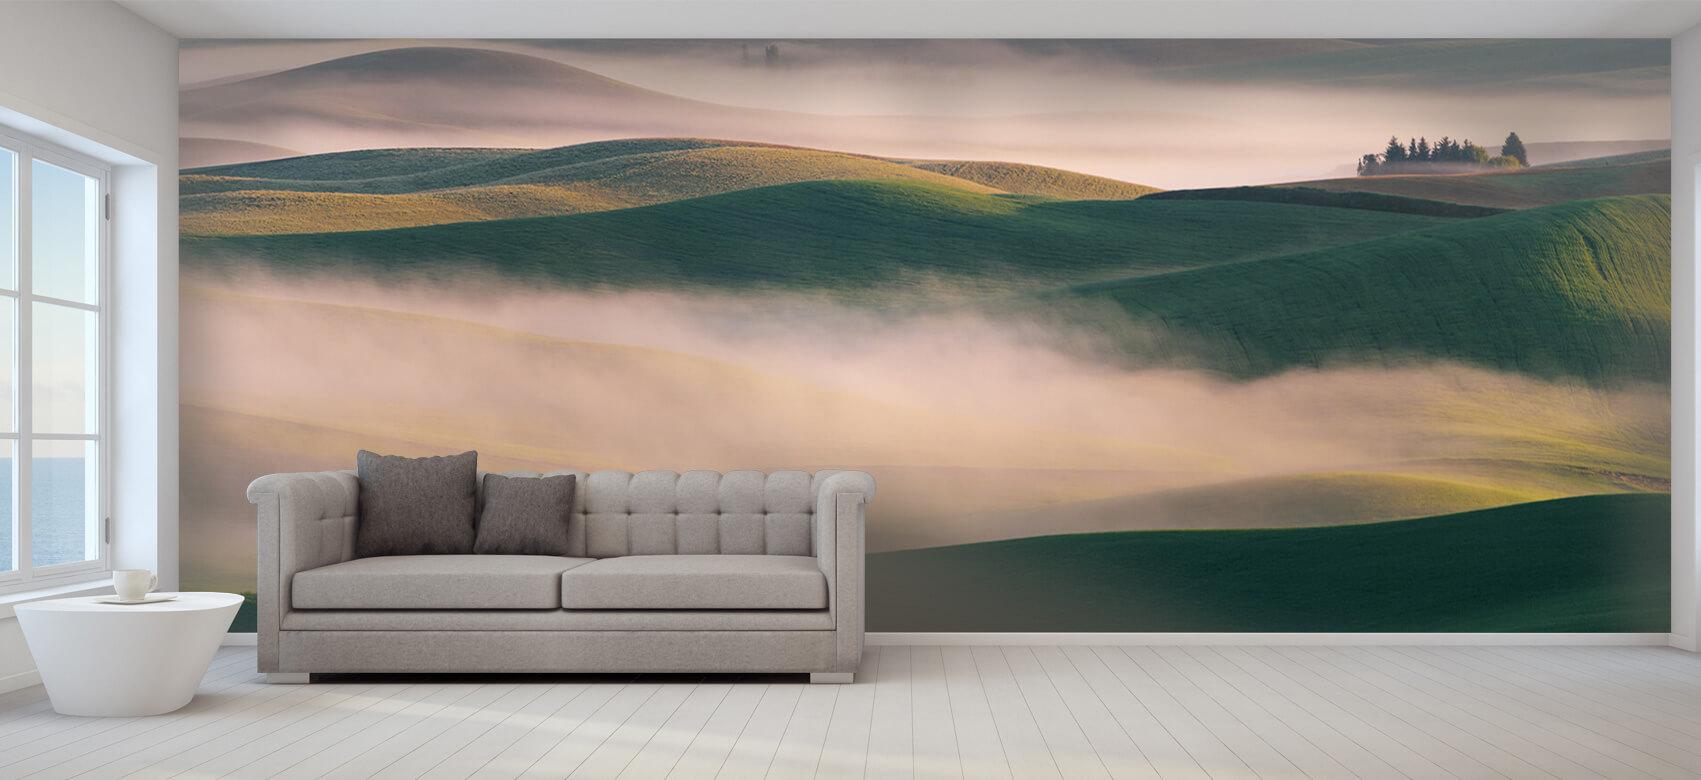 Landschap Dream Land in Morning Mist 8